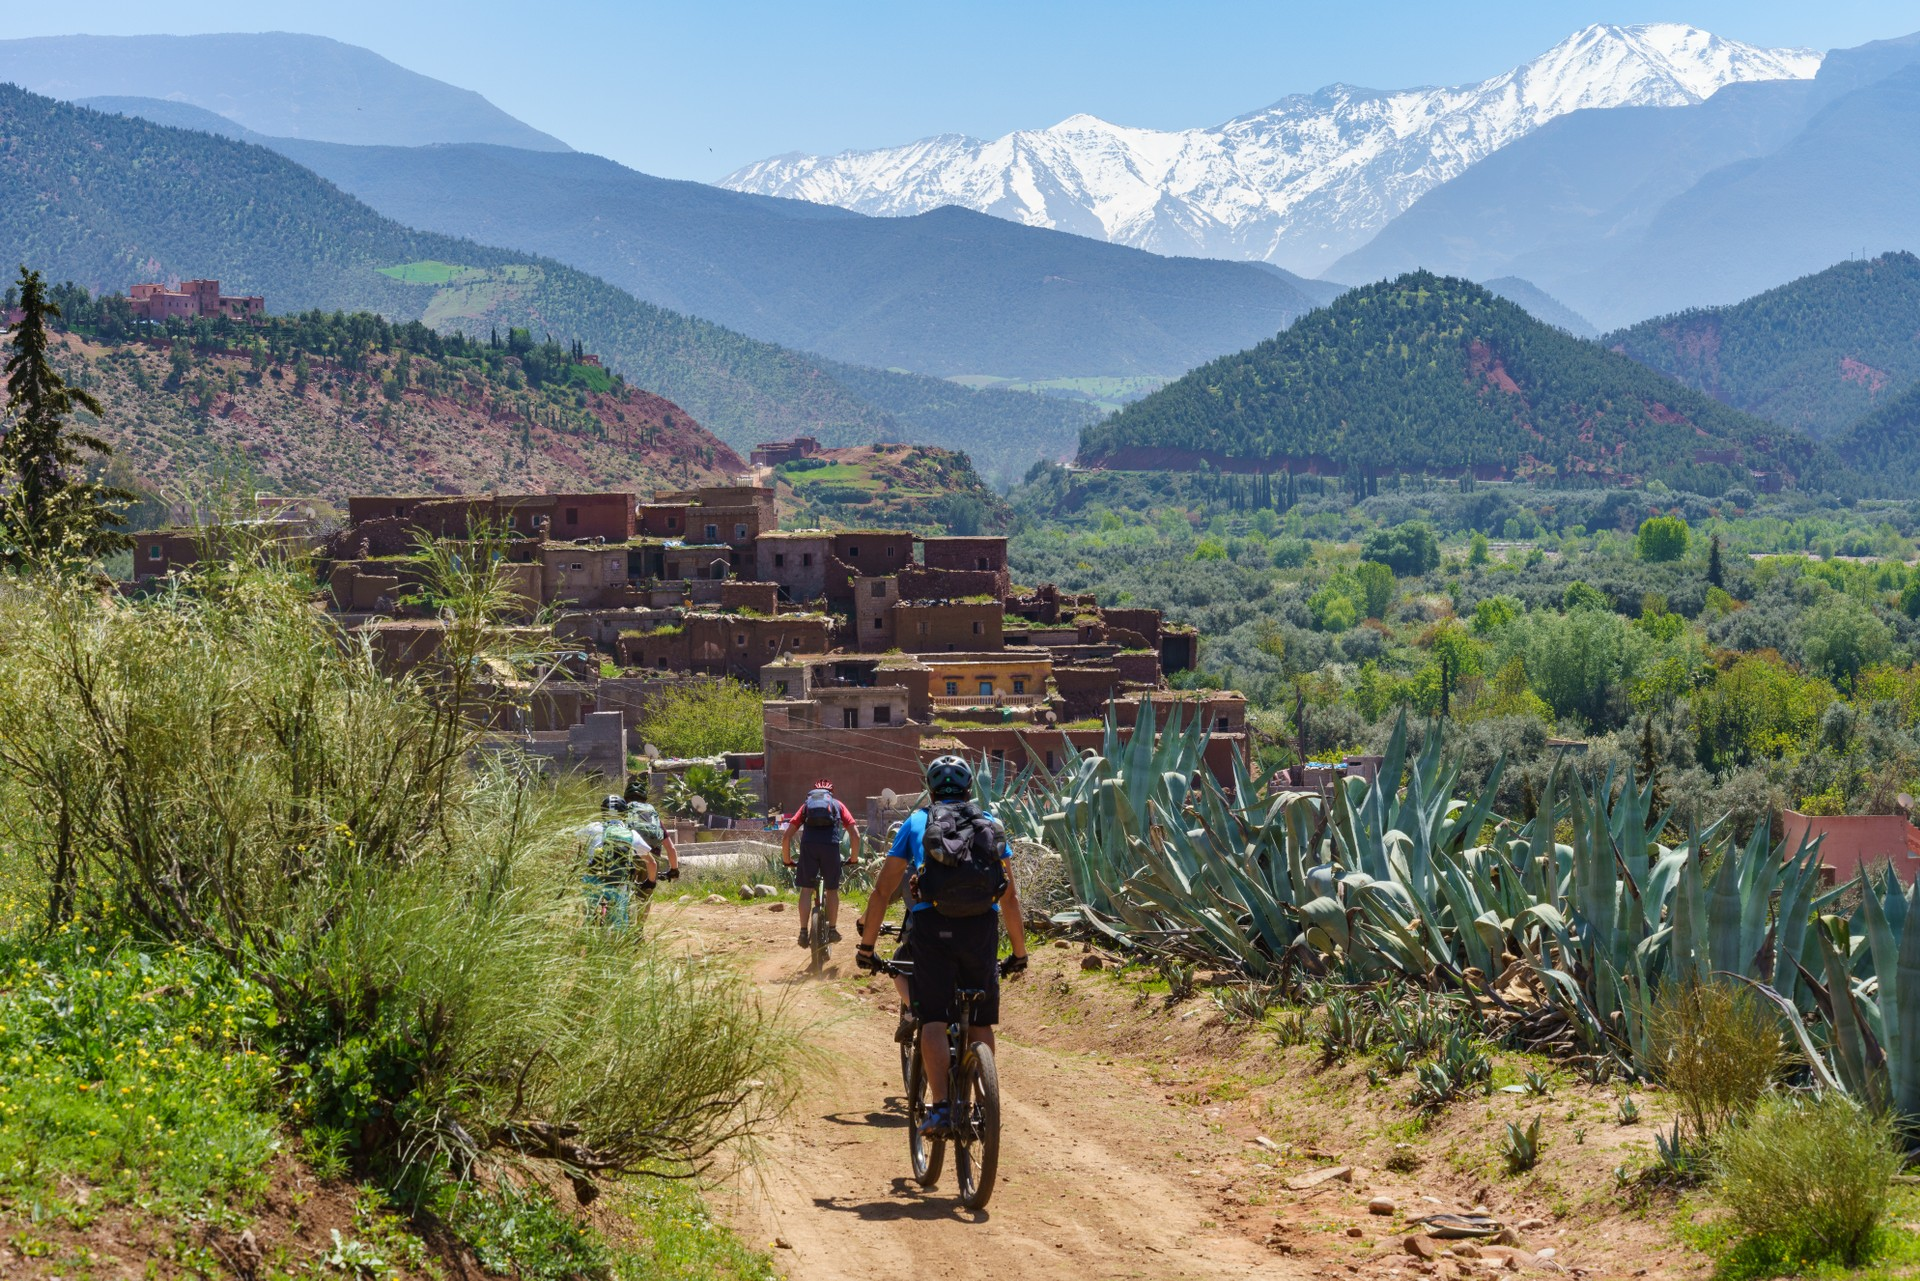 Mountain biking in Morocco's High Atlas